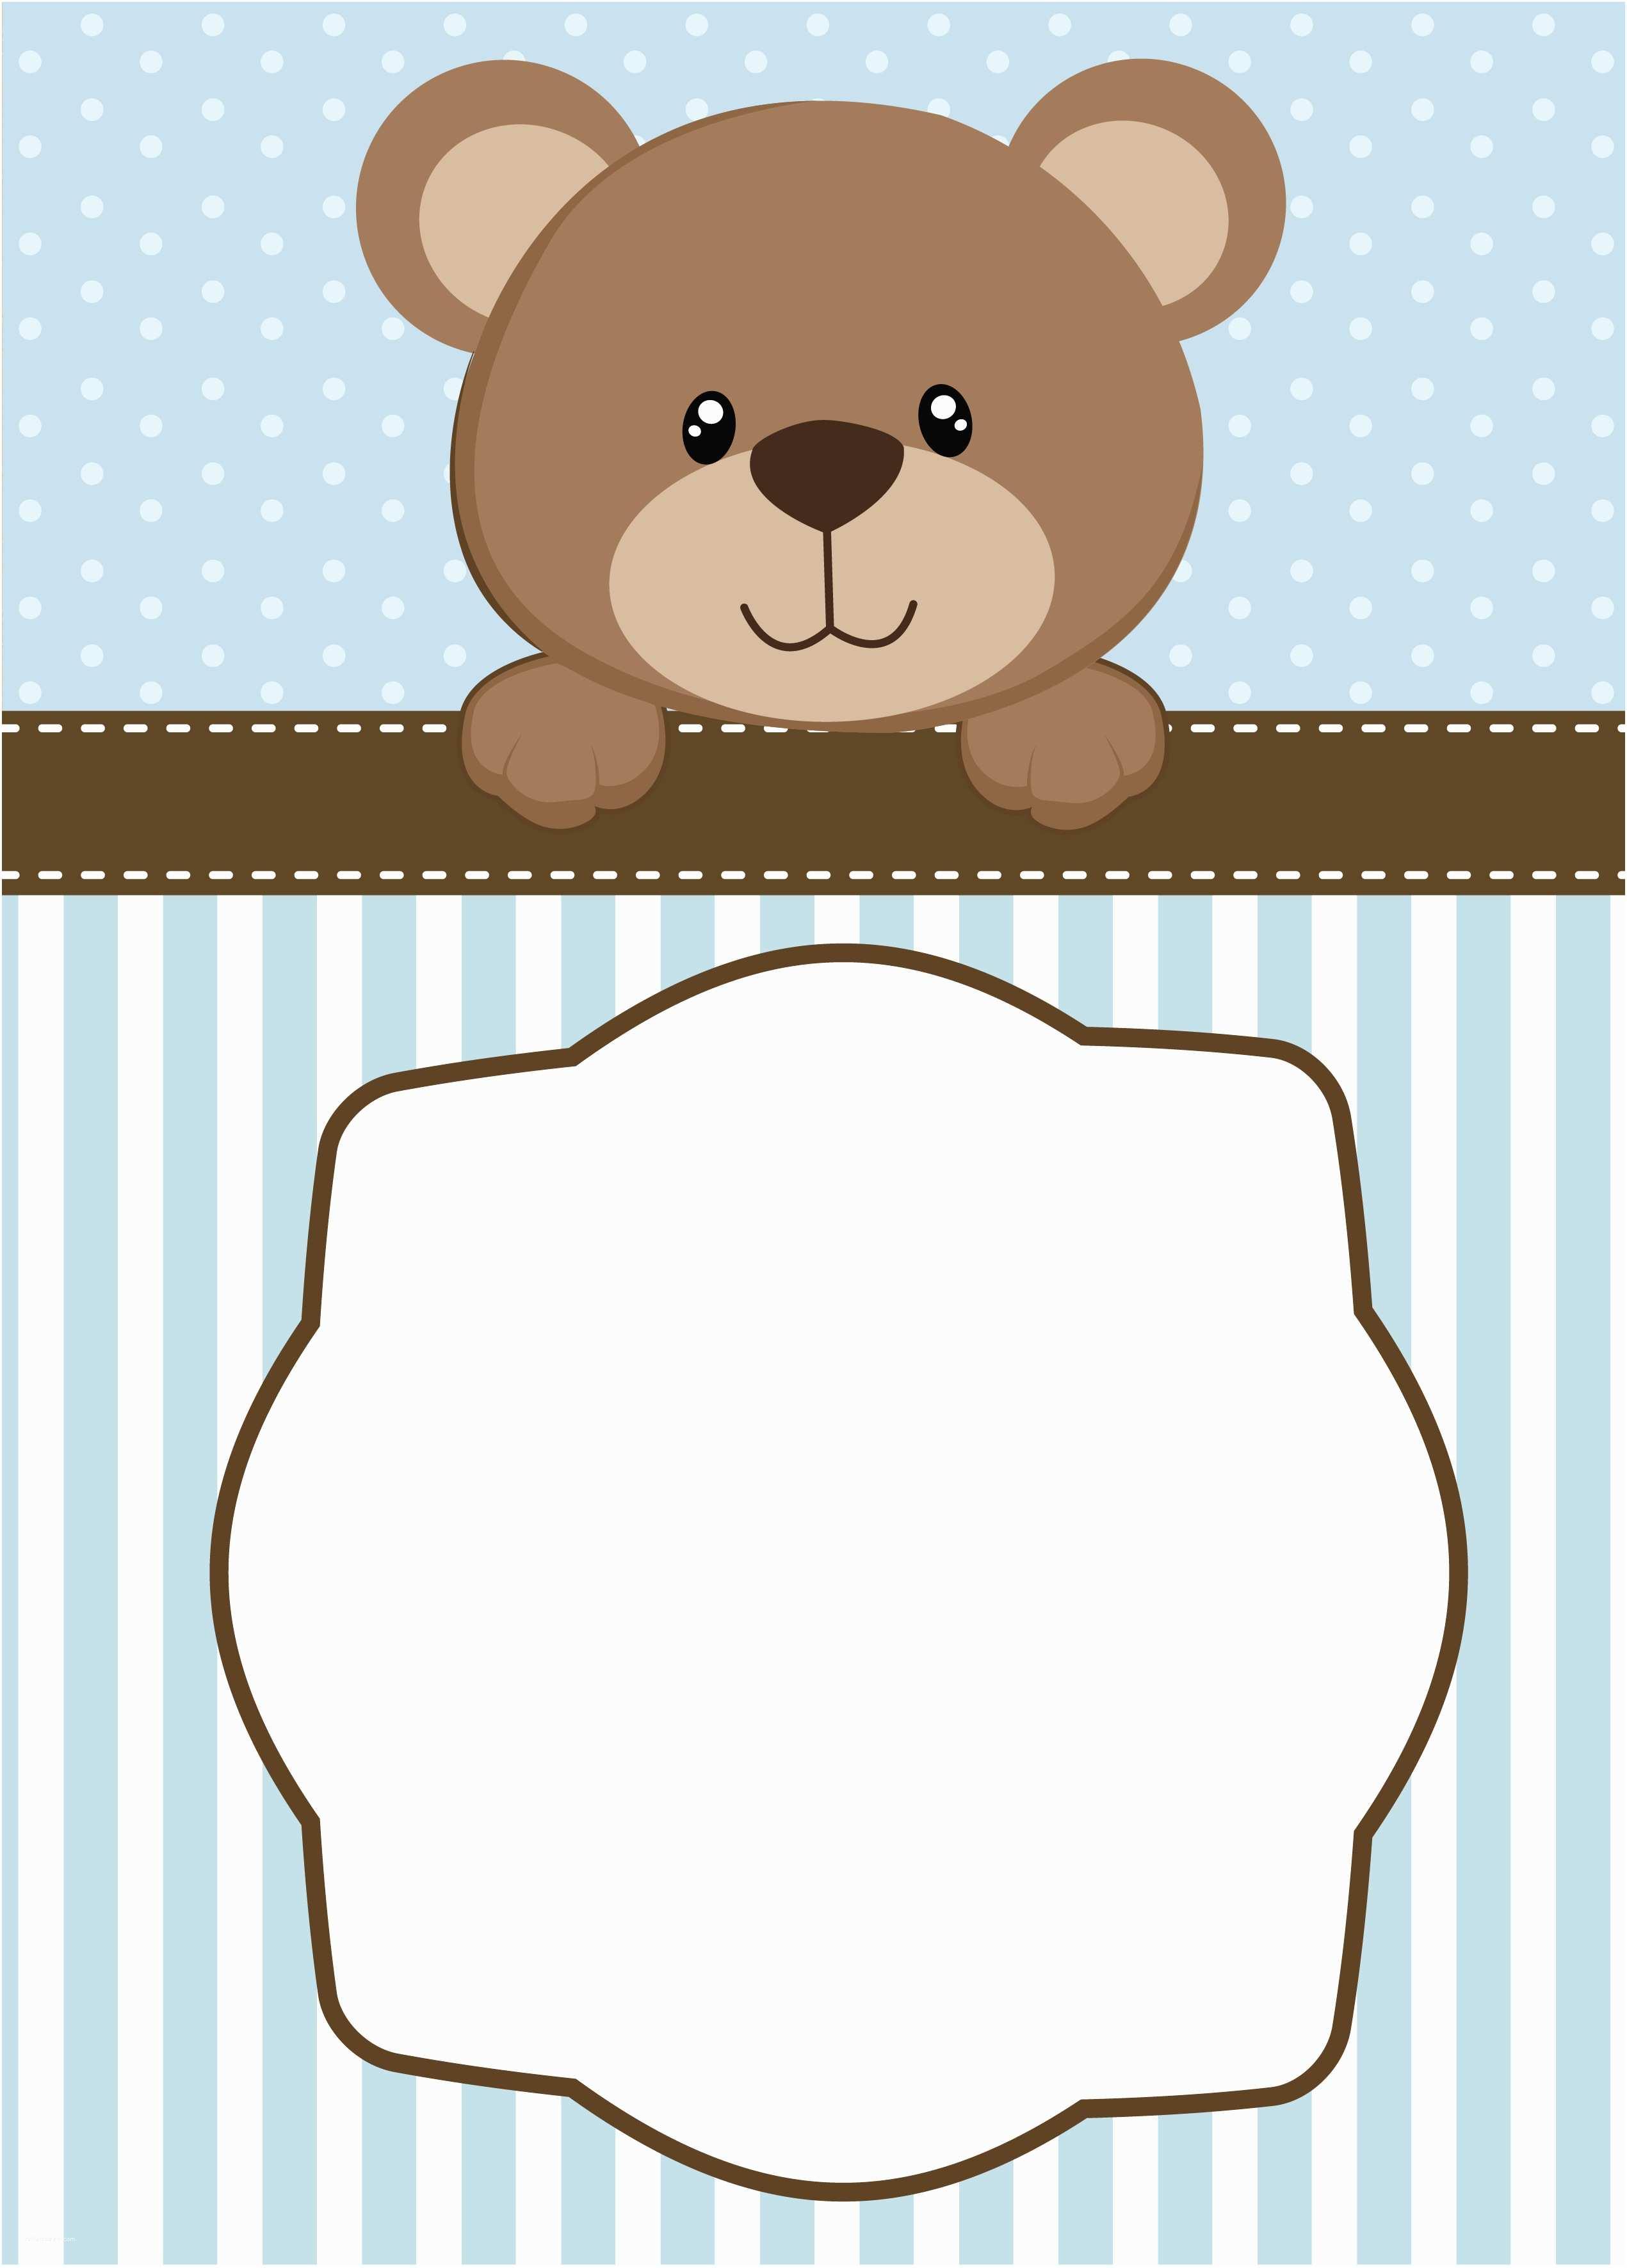 Teddy Bear Baby Shower Invitations Create Teddy Bear Baby Shower Invitations Printable